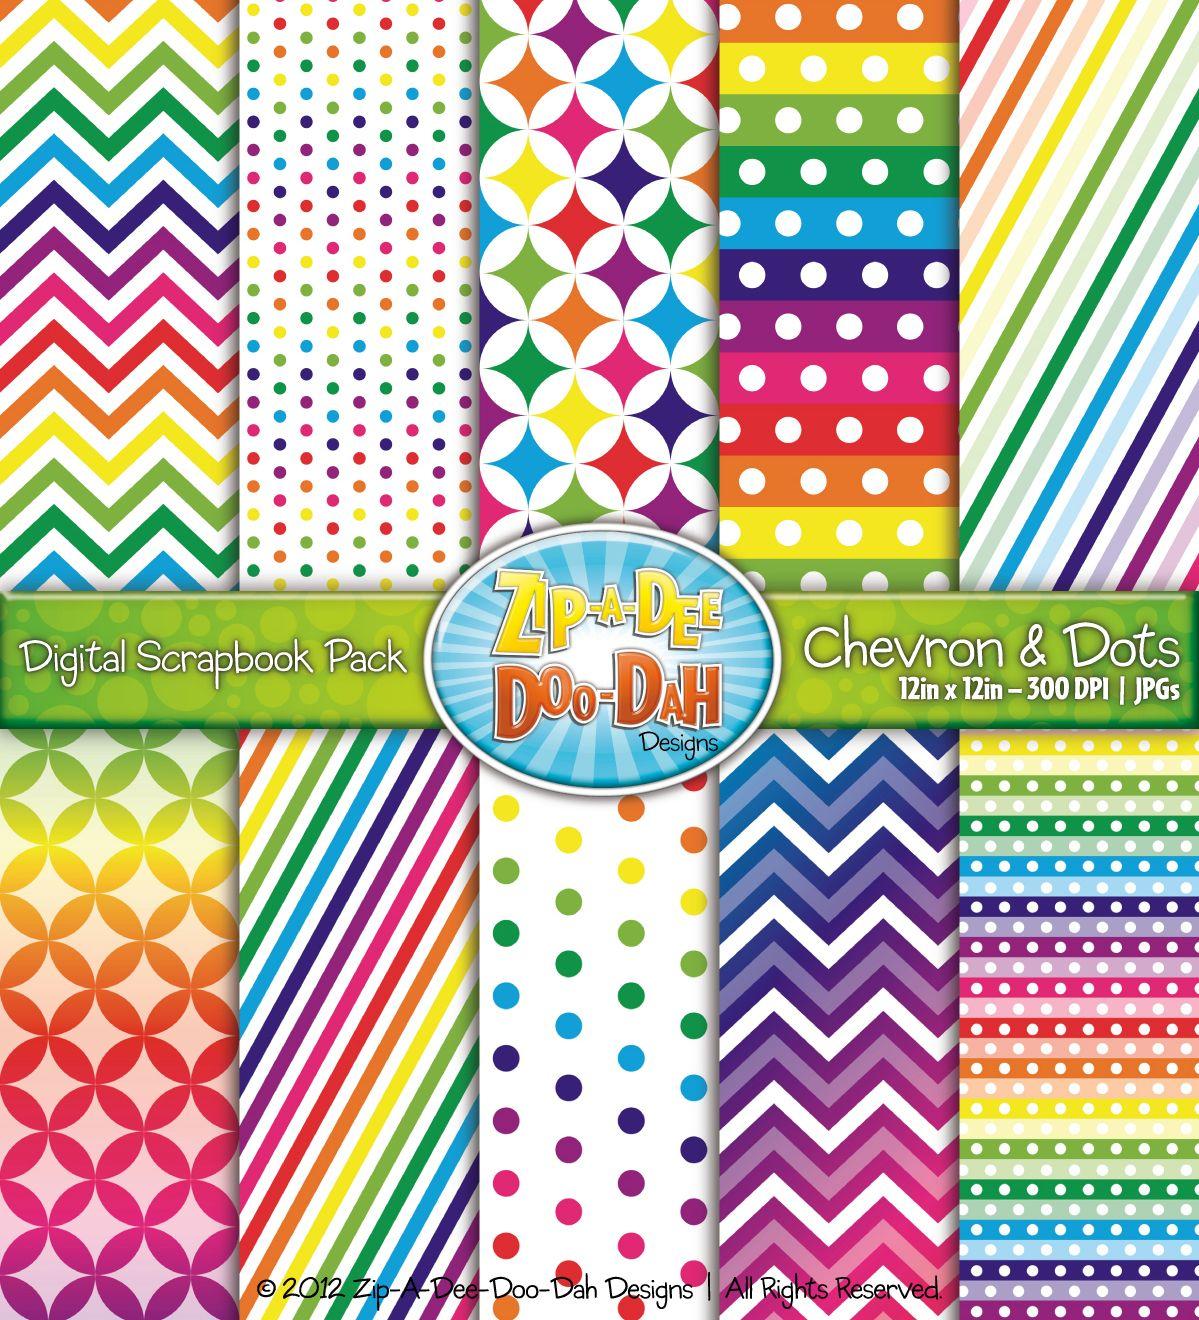 Scrapbook ideas rainbow - Chevron Dot Digital Scrapbook Pack Rainbow Pages